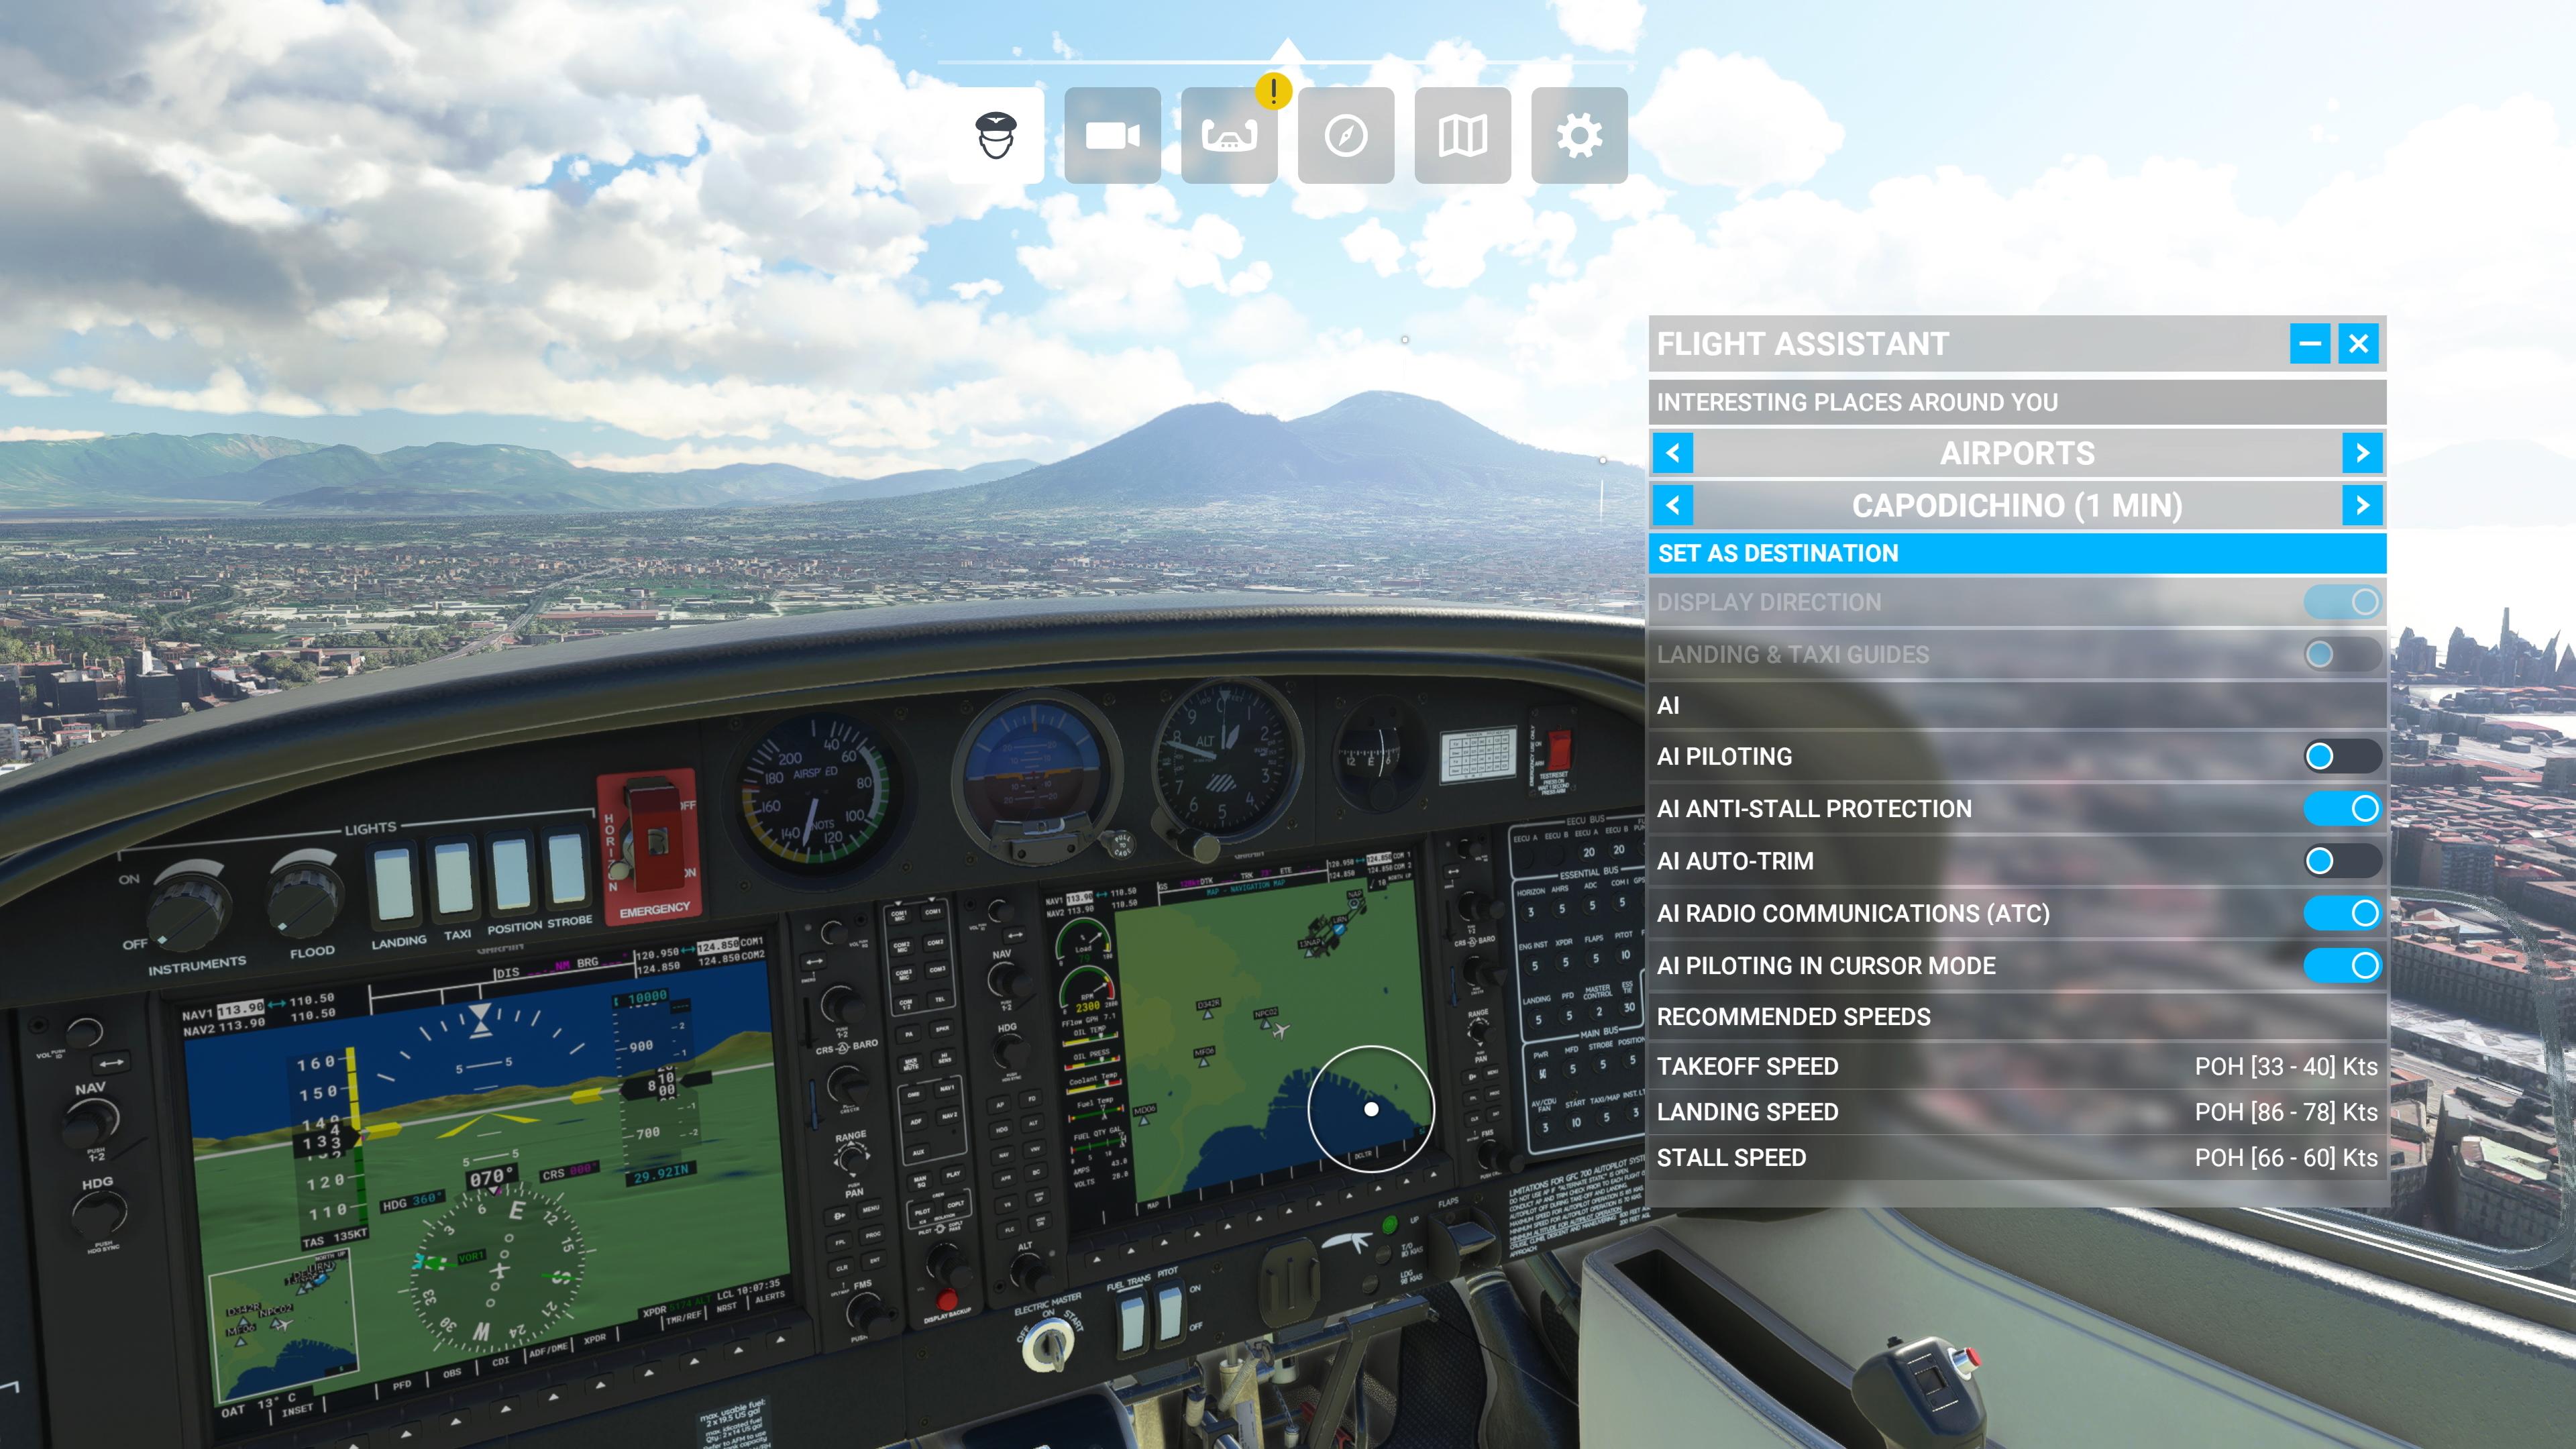 Microsoft Flight Simulator Launch On Xbox Series X|S